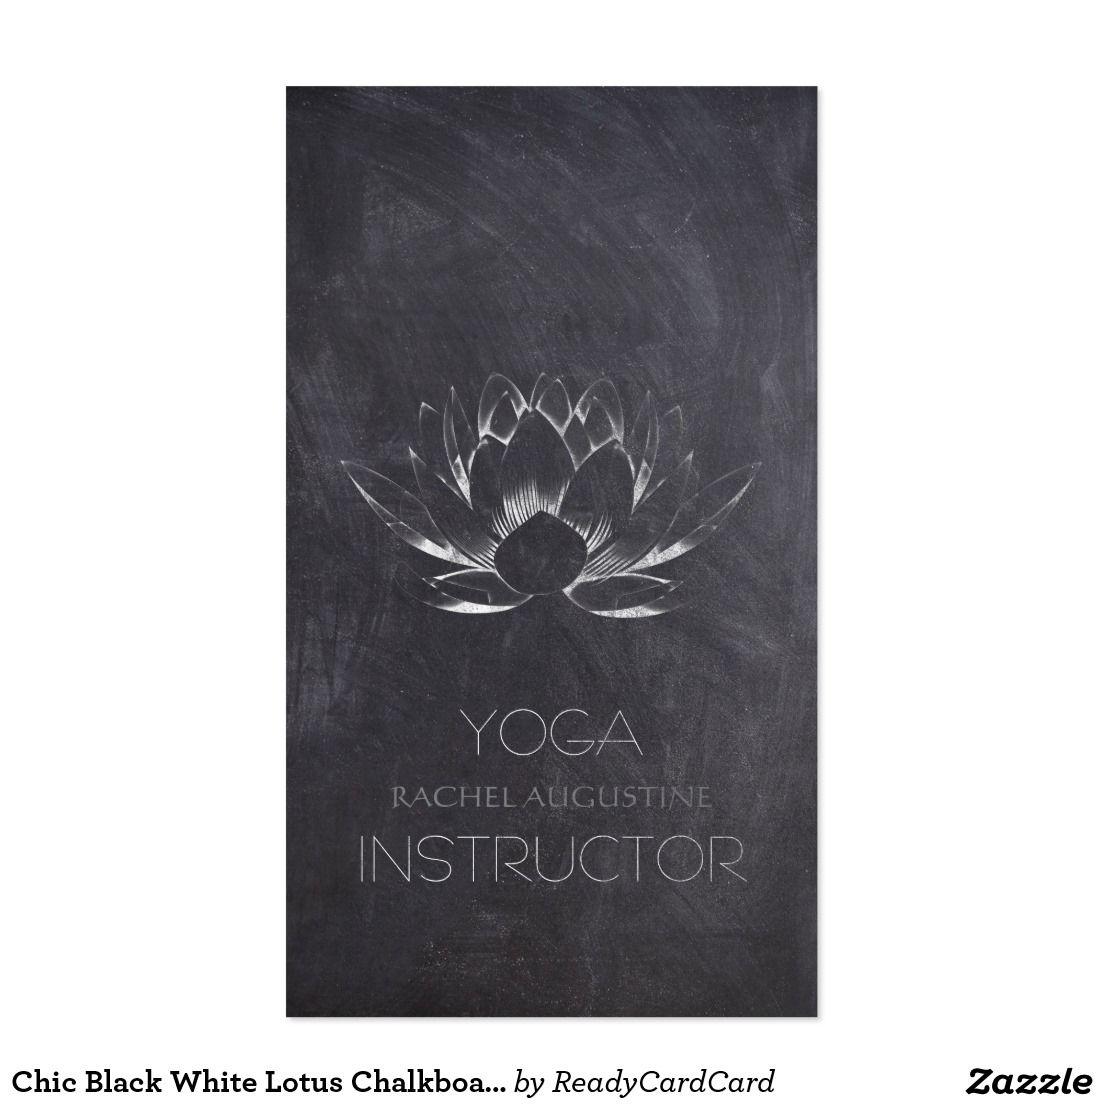 Chic Black White Lotus Chalkboard Yoga Instructor Business Card ...